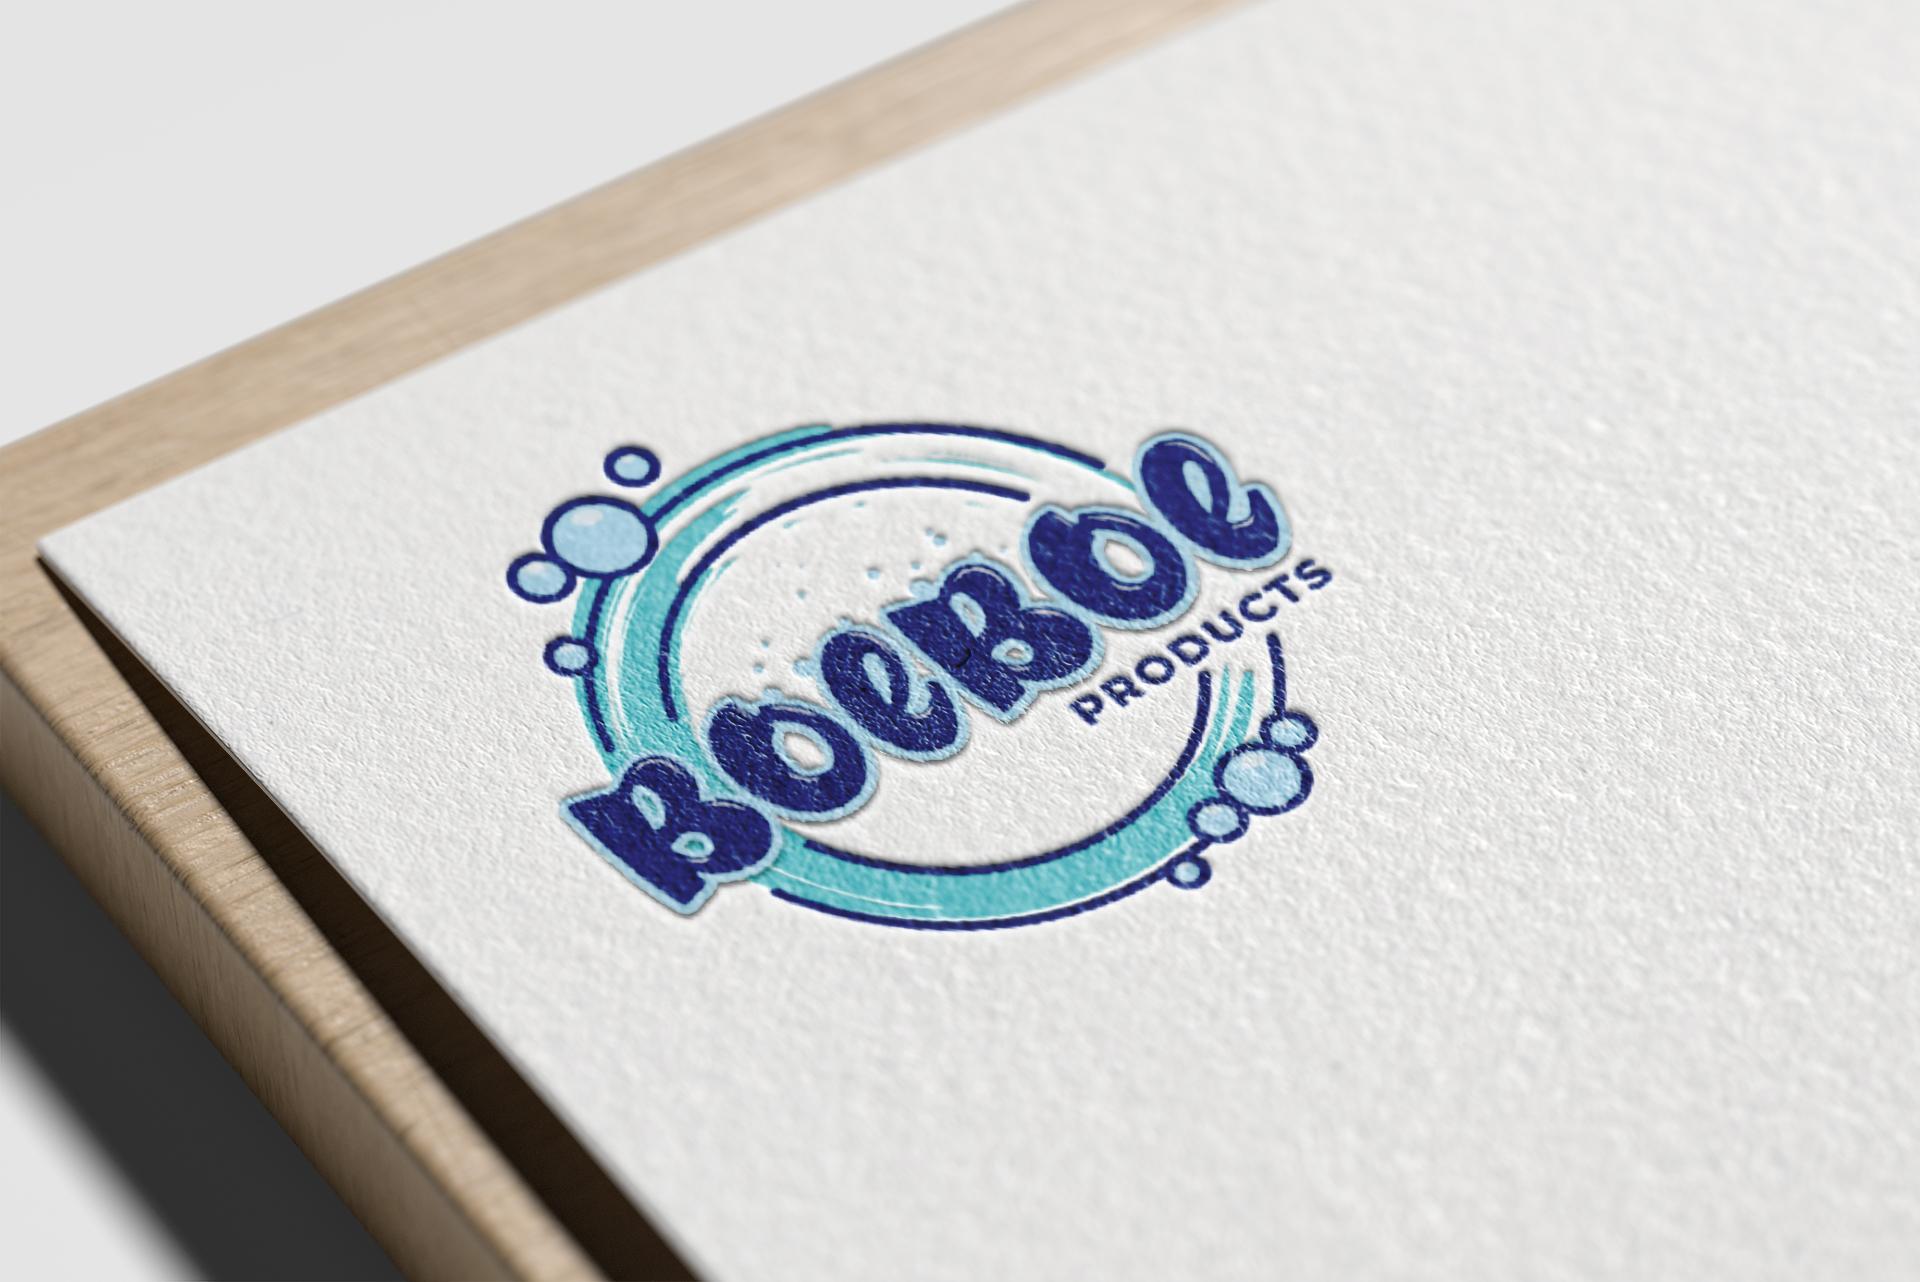 Boe Boe Bath Products Branding by WOW Creative Design Studio